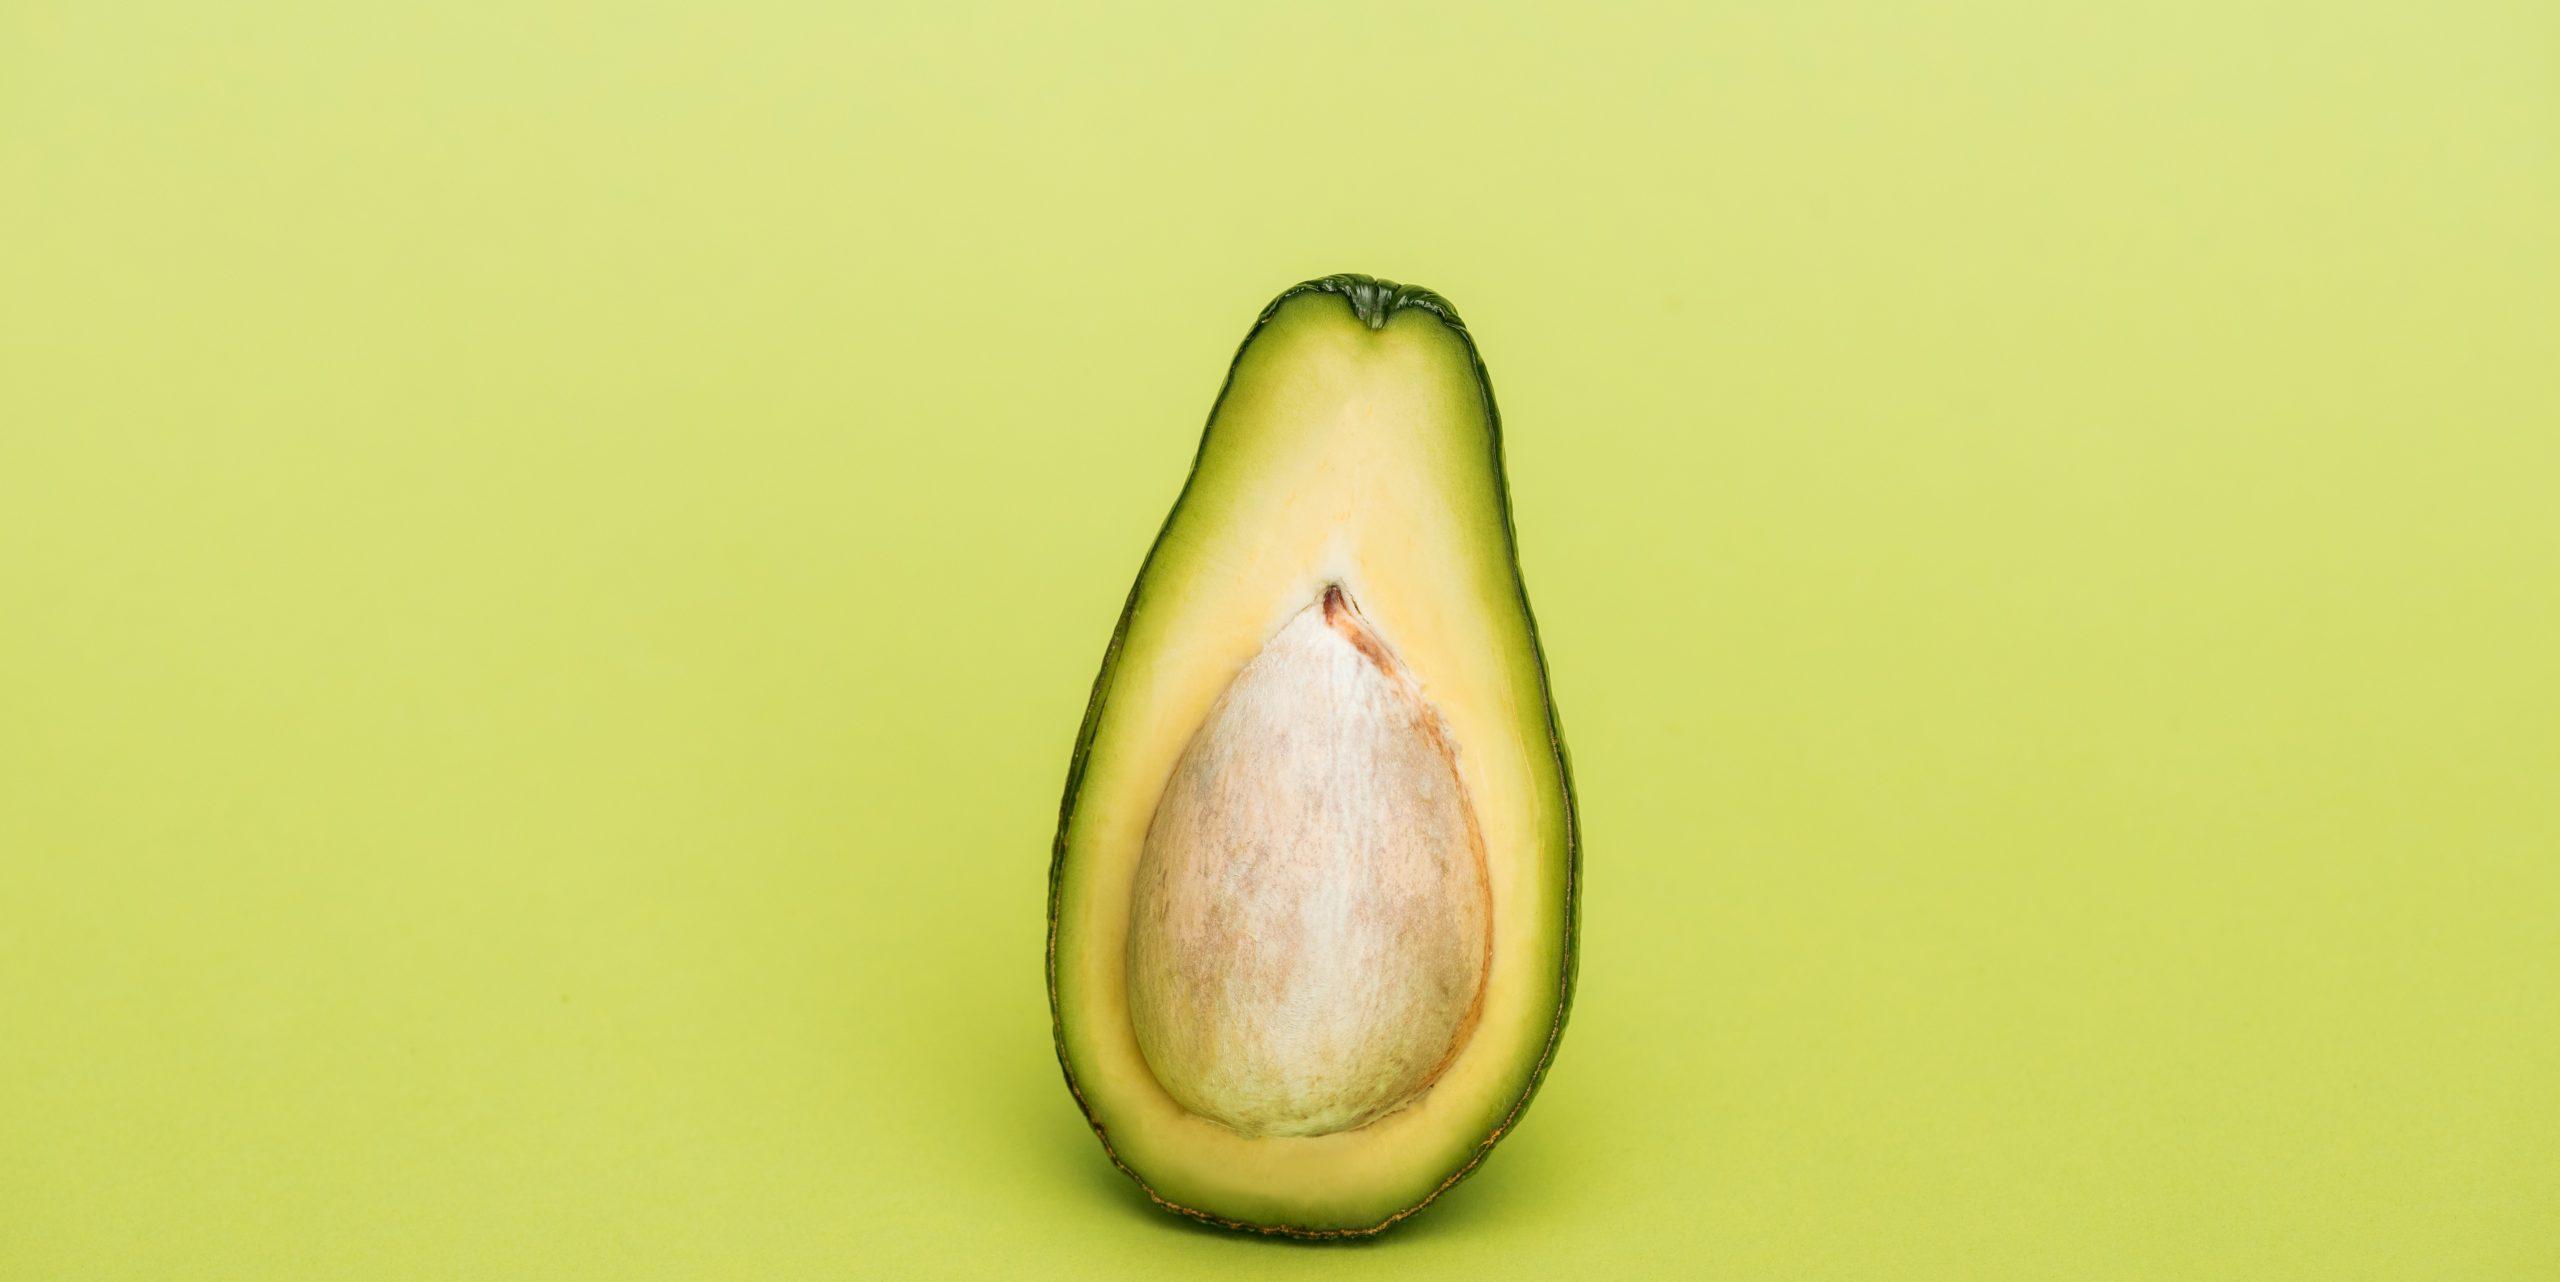 Top 10 Avocado Tries